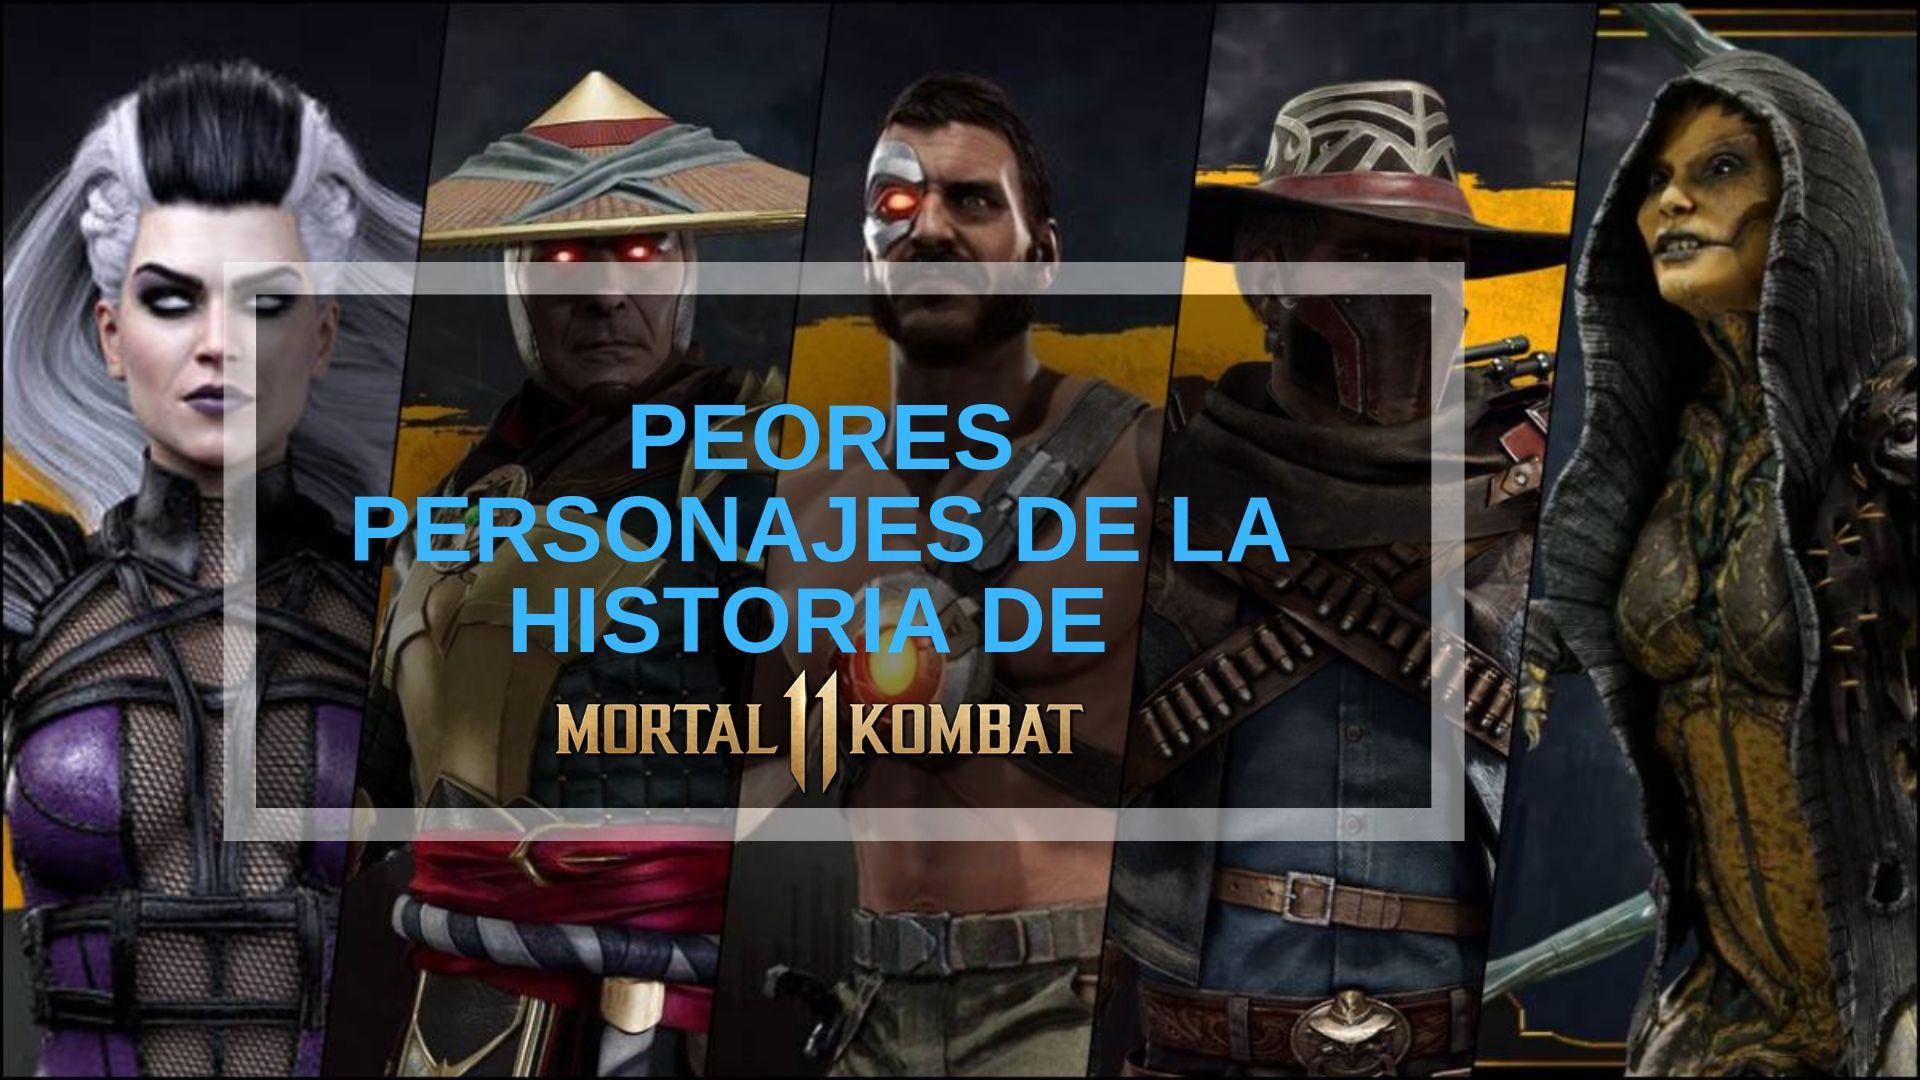 Peores personajes de Mortal Kombat